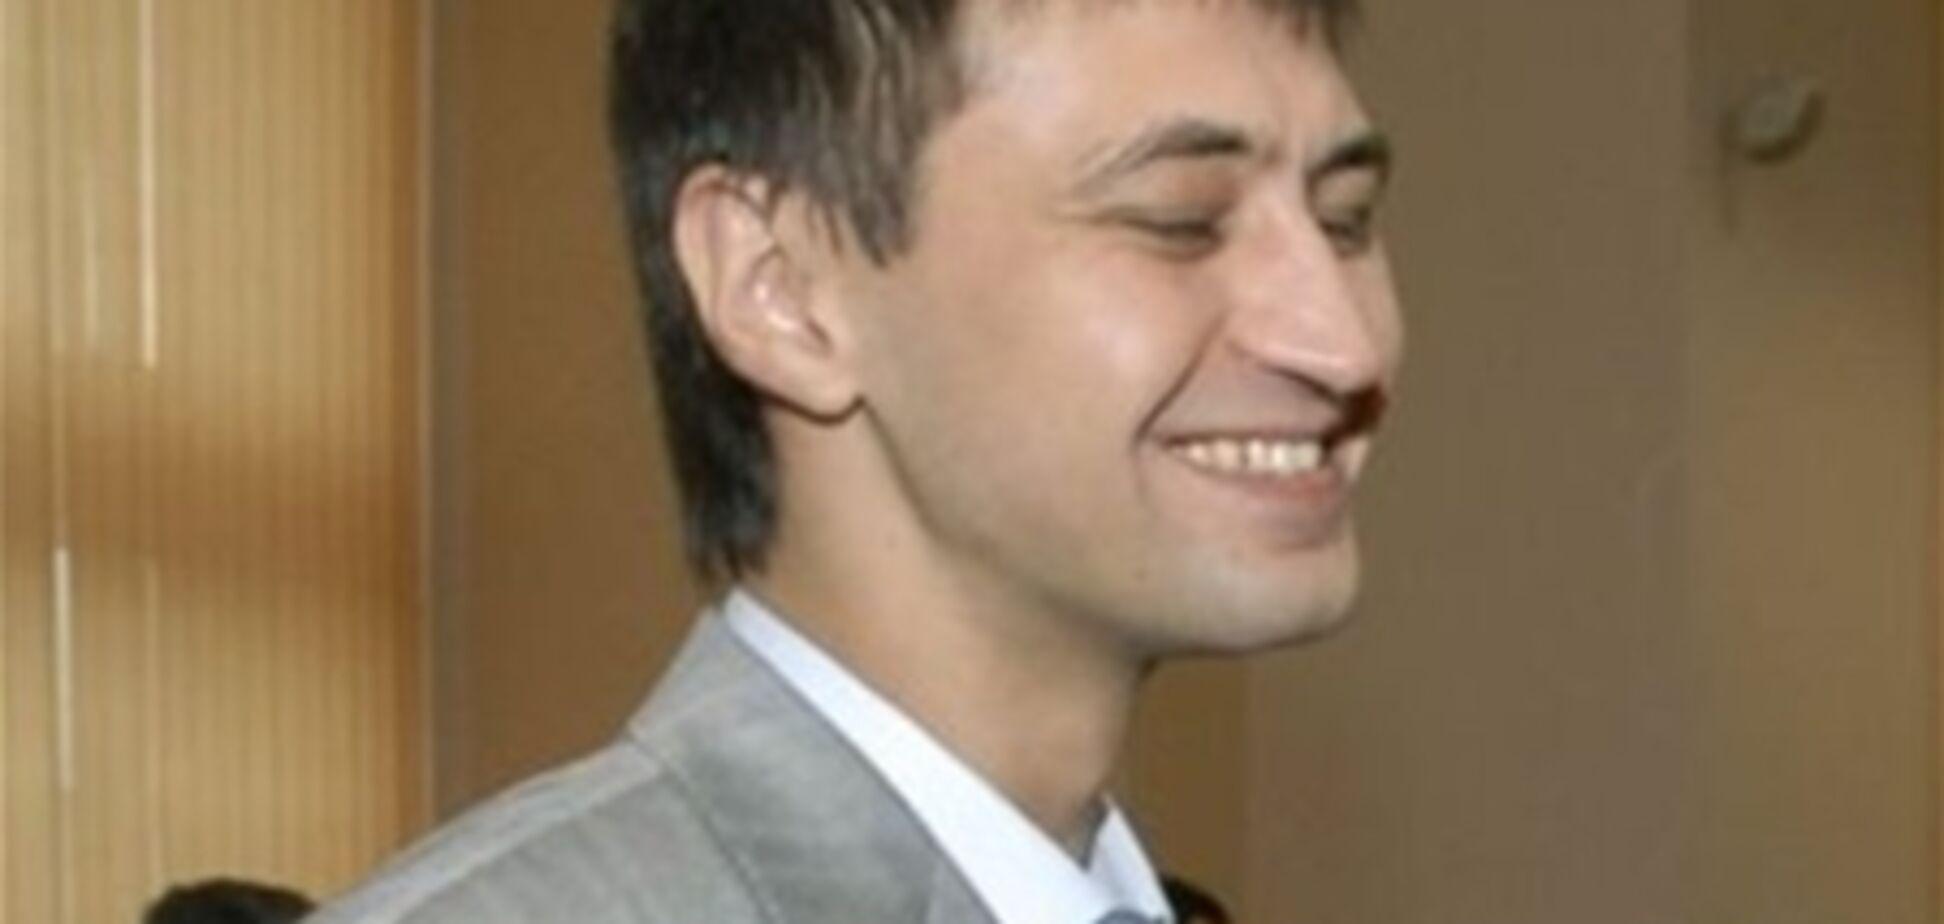 Юрист: $5000 компенсации не спасут Ландика от тюрьмы